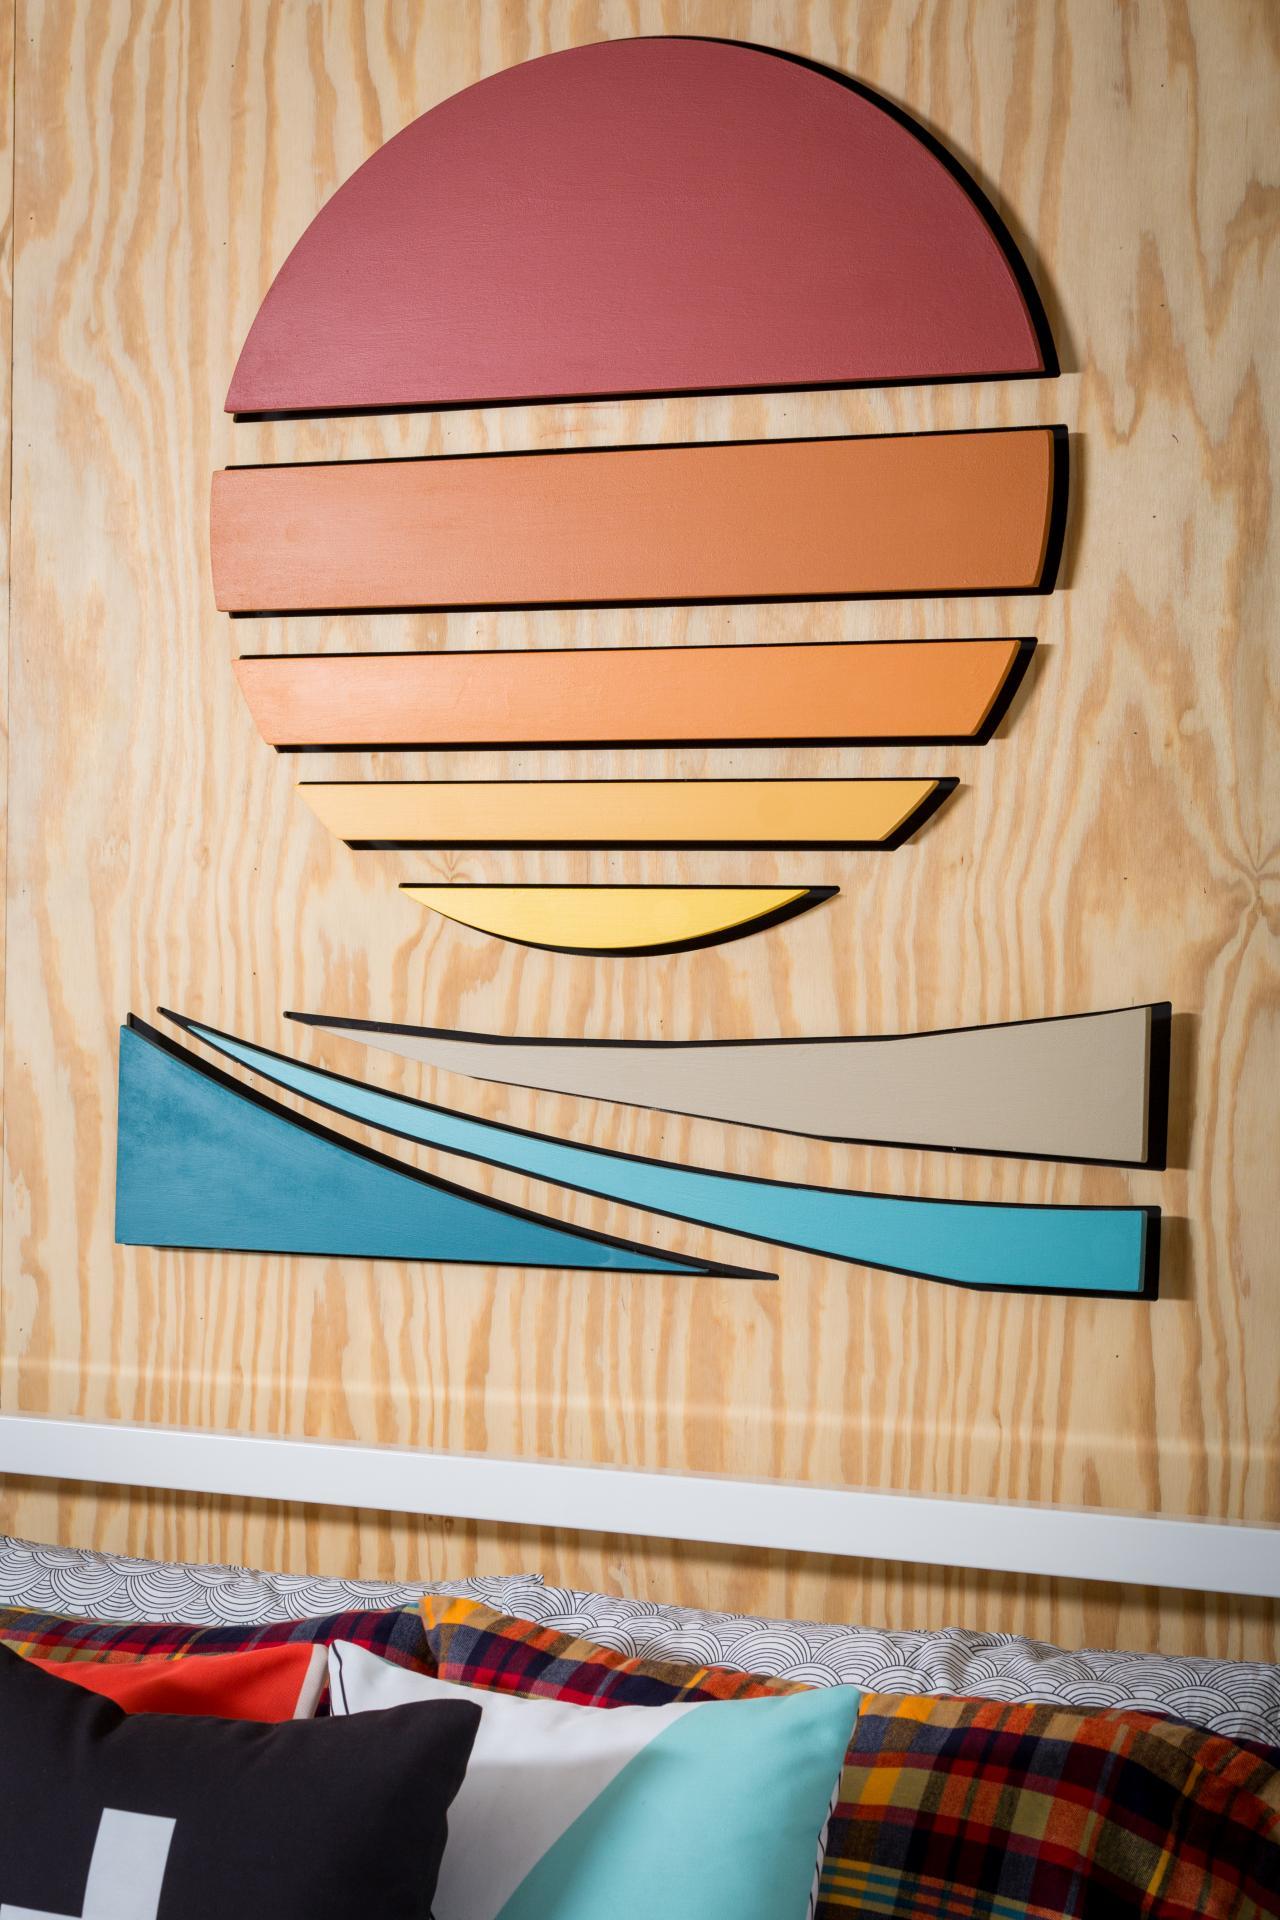 Surfing Bedroom Decor Boys Surf Culture Inspired Bedroom Jj Design Group Hgtv